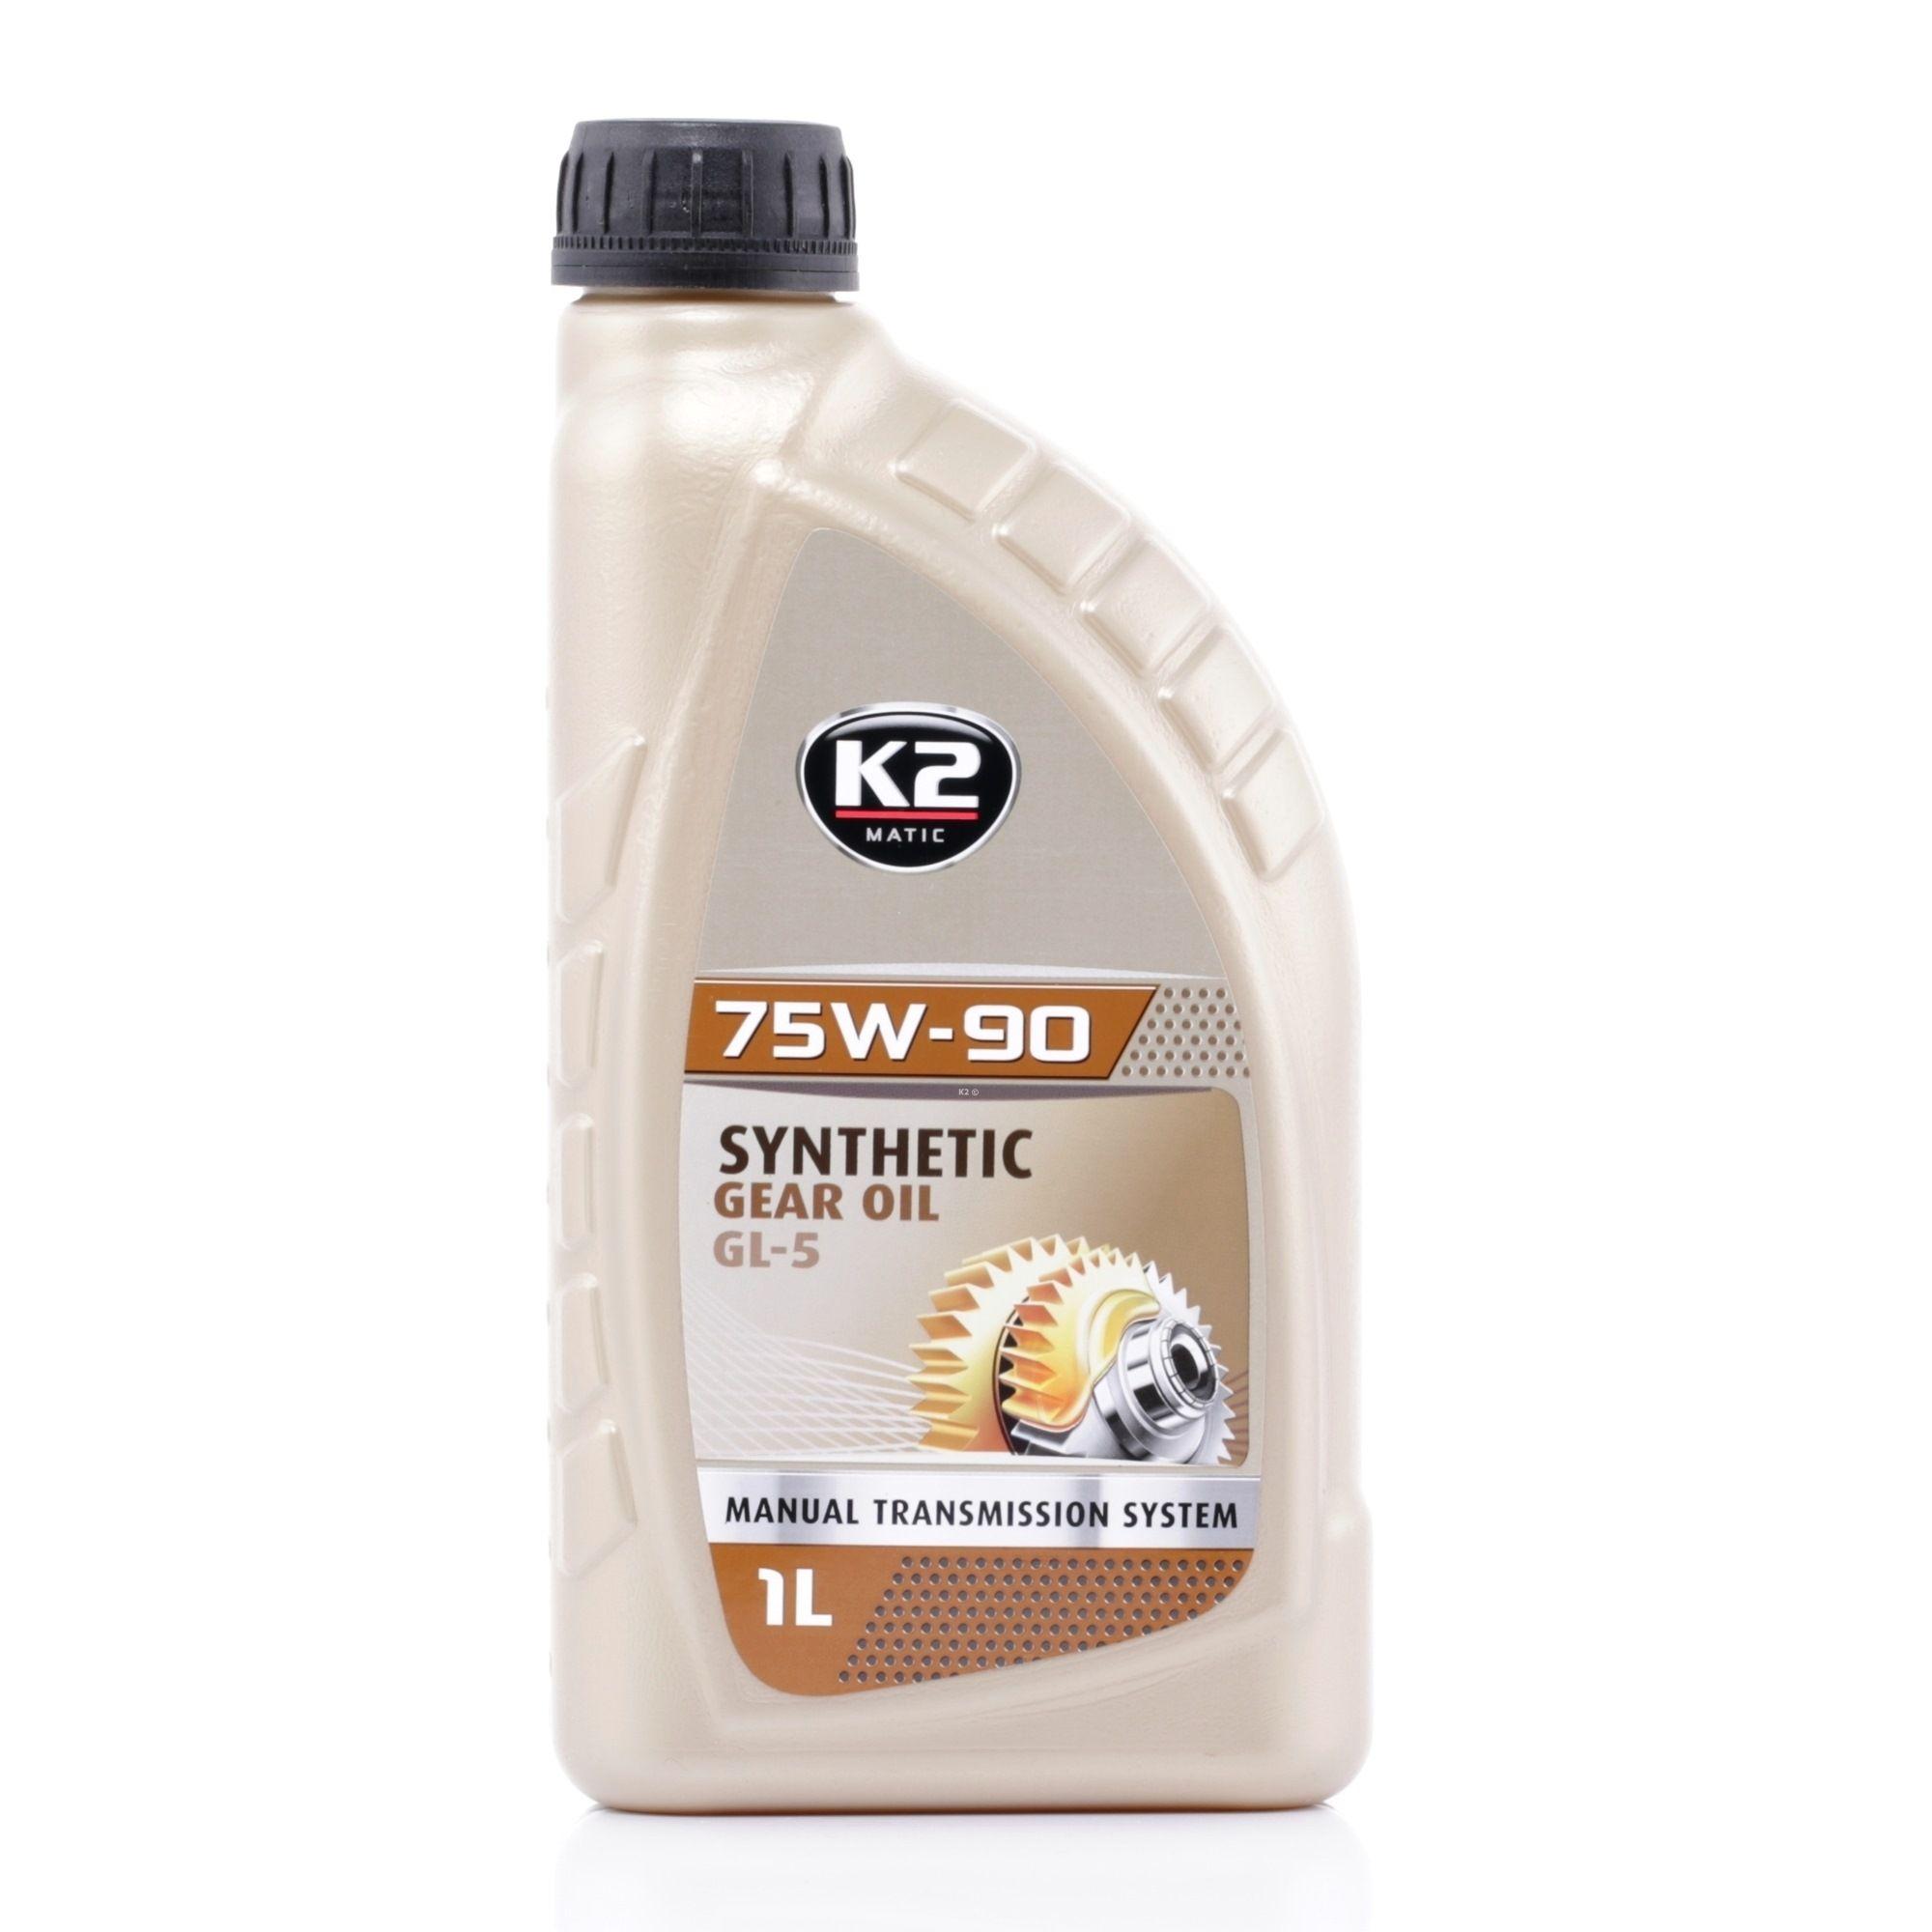 Getriebeöl K2 O5561S Bewertung